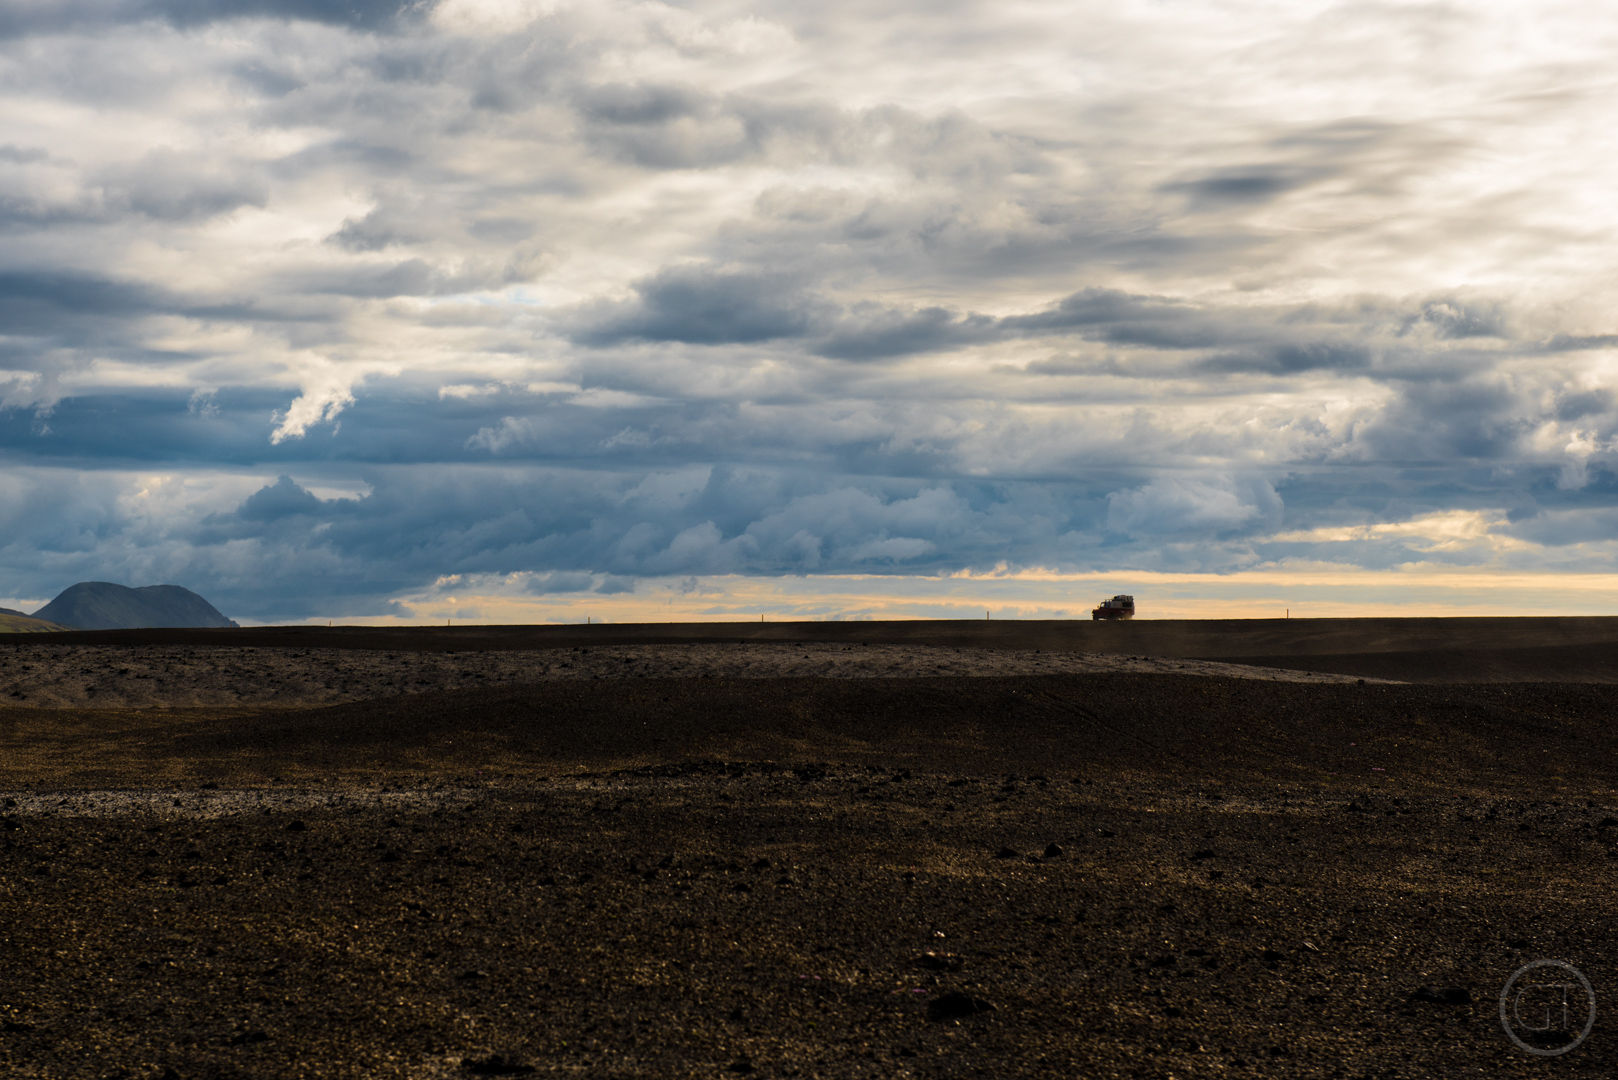 Iceland-gustav-thuesen-photography-landscape-nature-københavn-danmark-adventure-outdoor-lifestyle-7.jpg